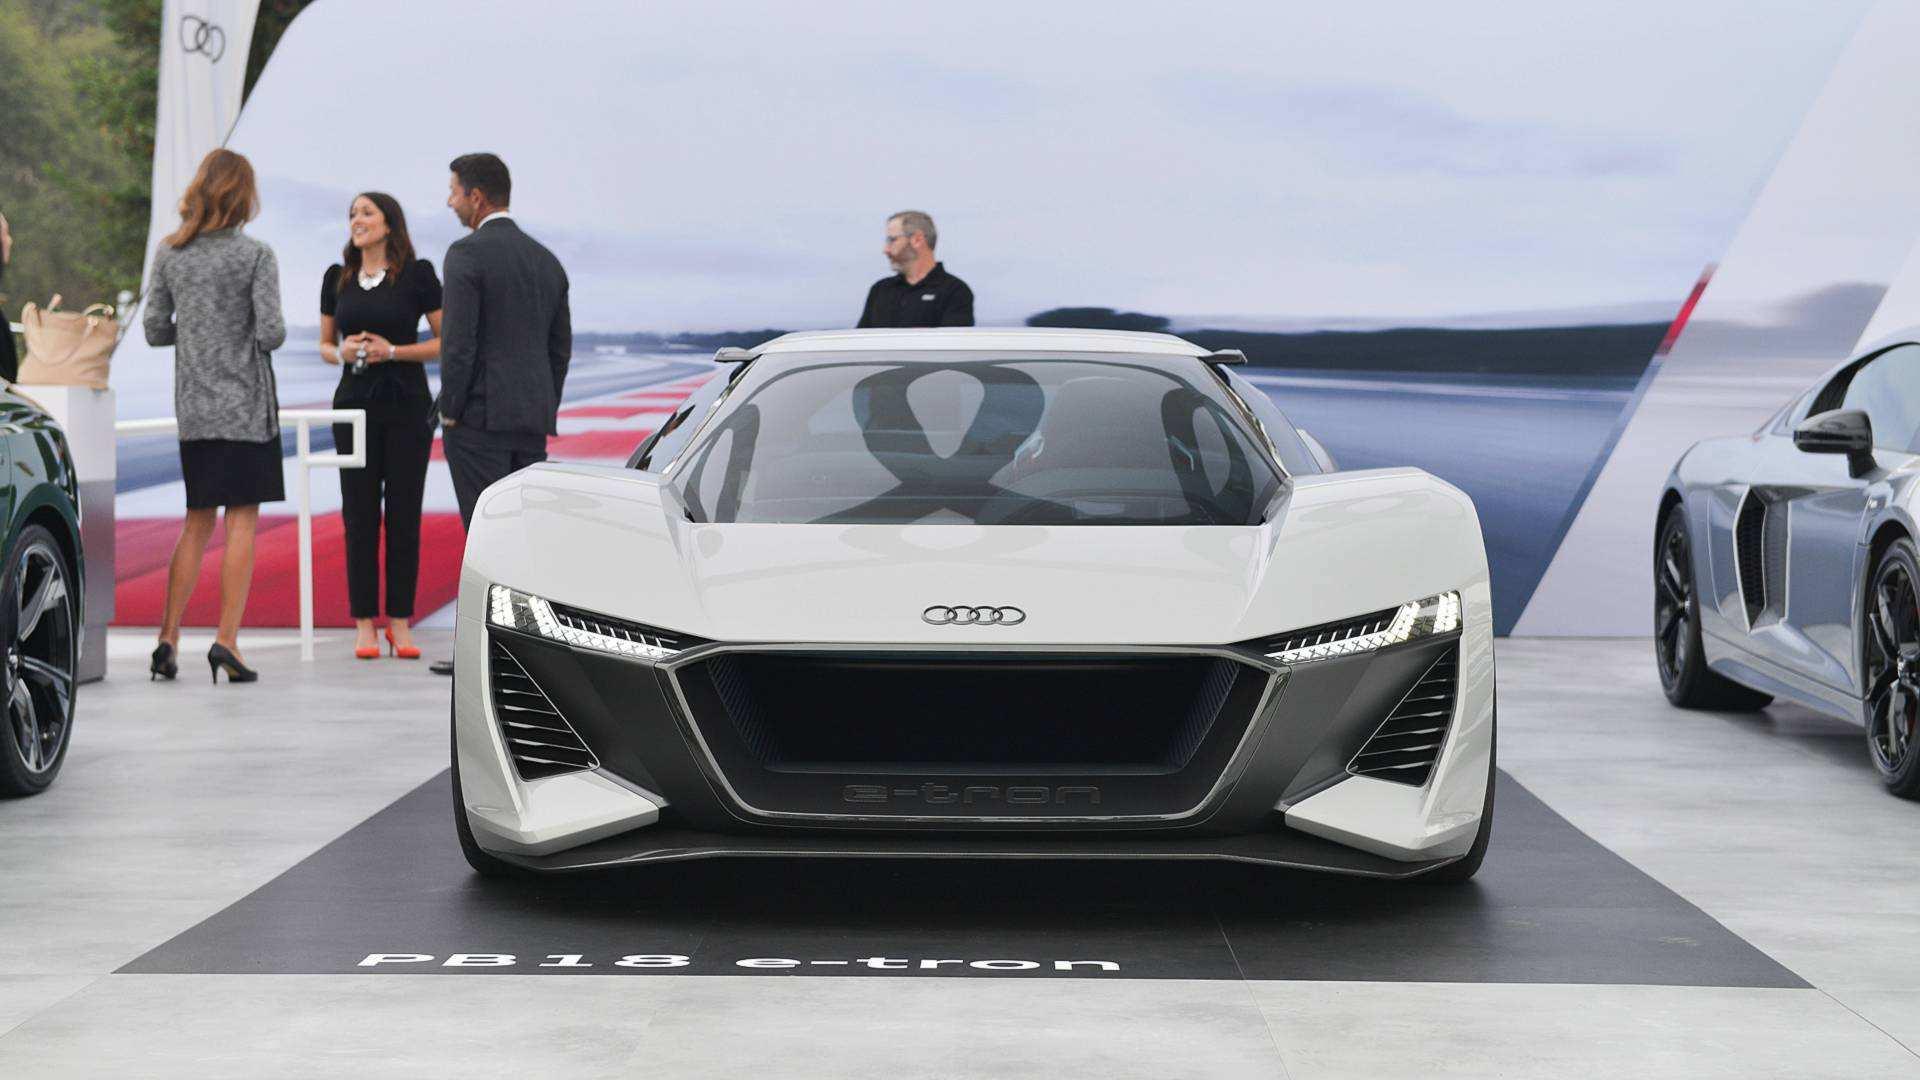 18 New Audi E Tron 2020 Performance for Audi E Tron 2020